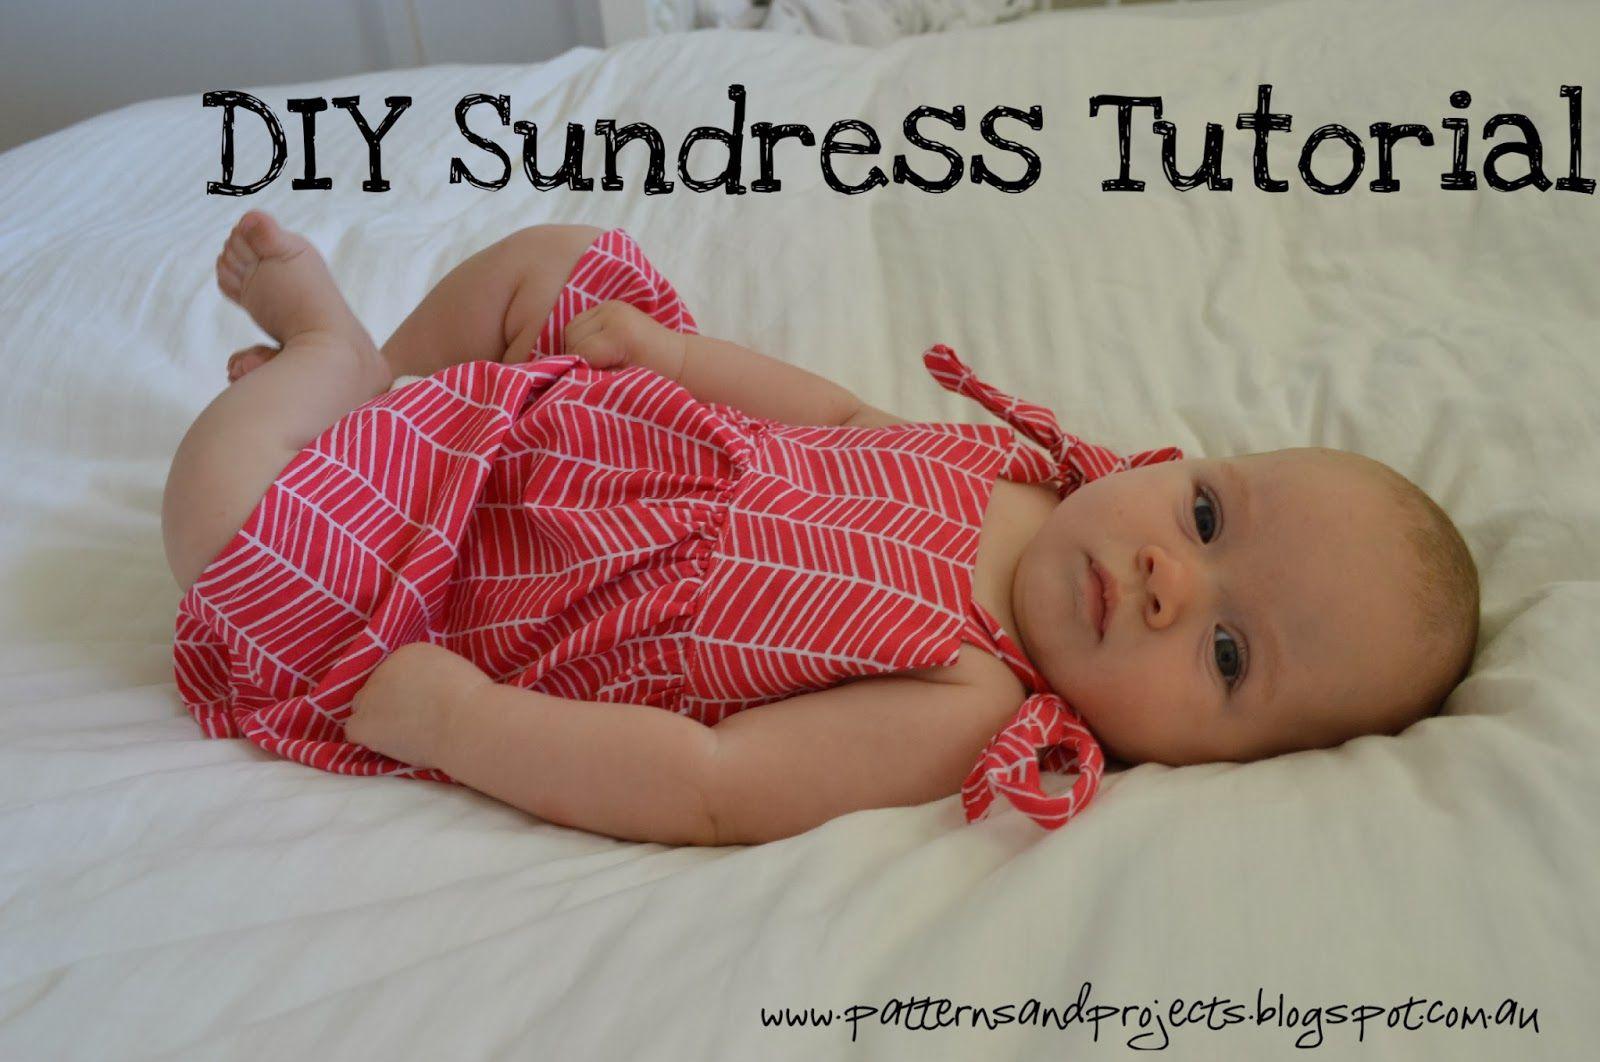 Patterns & Projects: DIY Sundress Tutorial (6-12M)